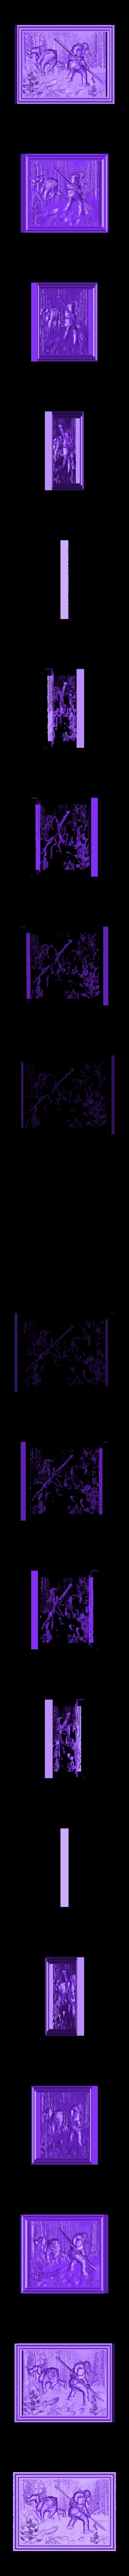 901. Panno.stl Download free STL file Hunting Theme, Bear • 3D printable object, stl3dmodel